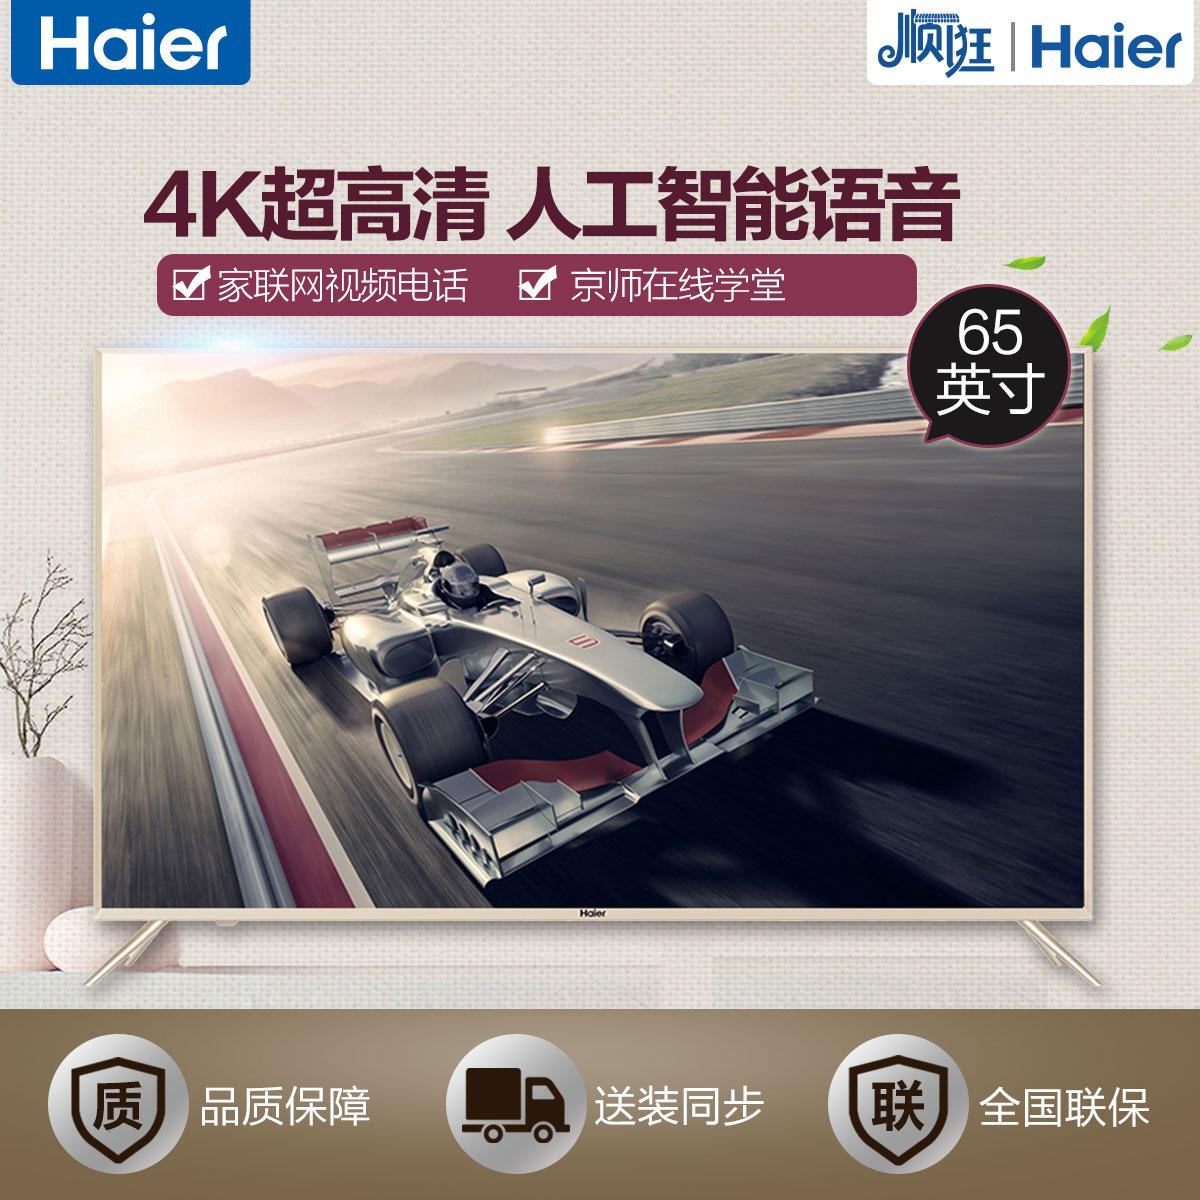 Haier/海尔             4K电视             LS65AL88A71